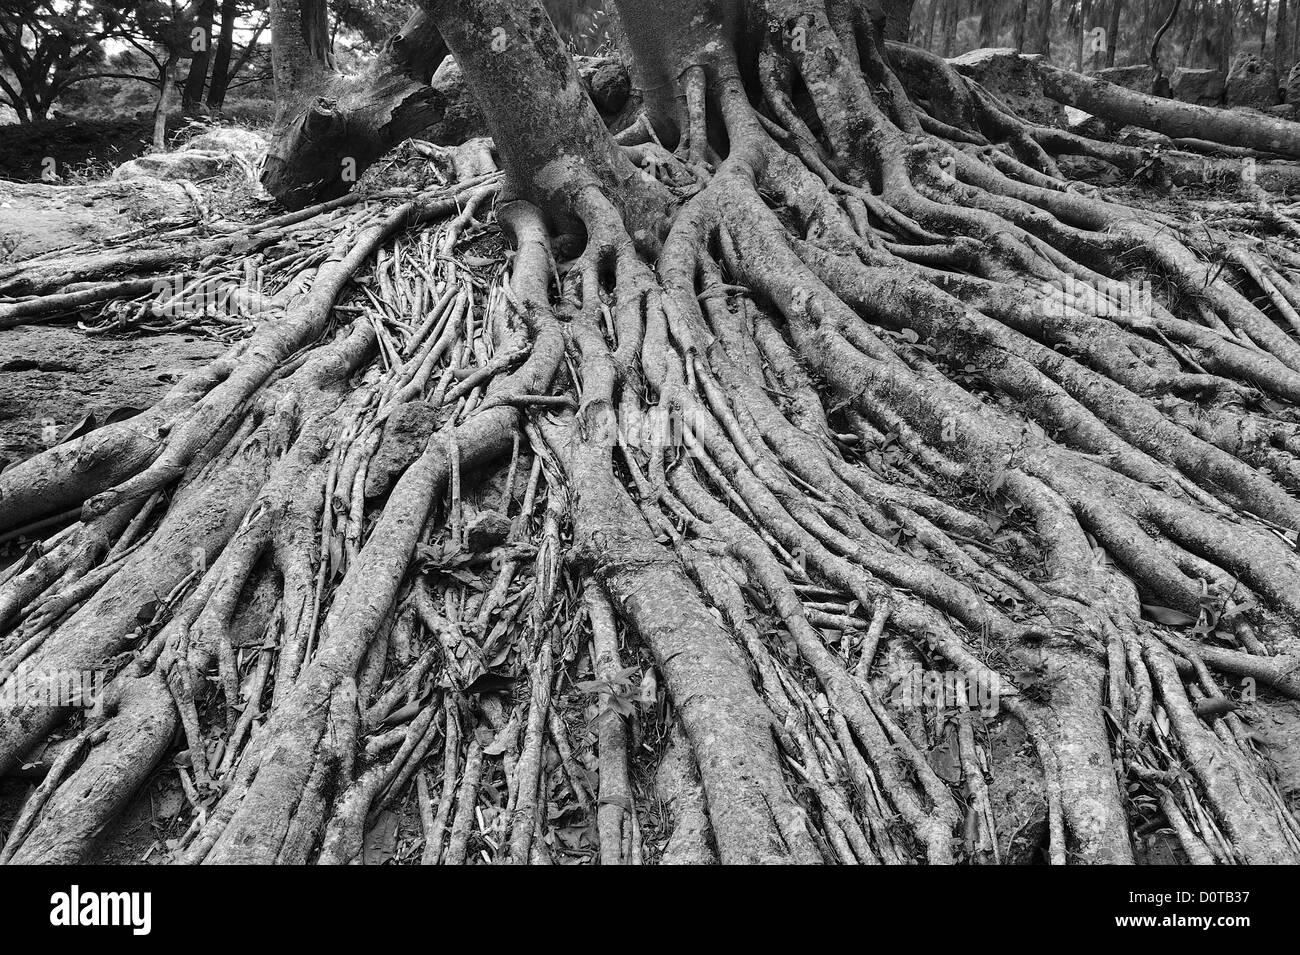 Tree, roots, Parque El Picacho, City Park, Tegucigalpa, capital, City, Central America, Honduras, nature Stock Photo